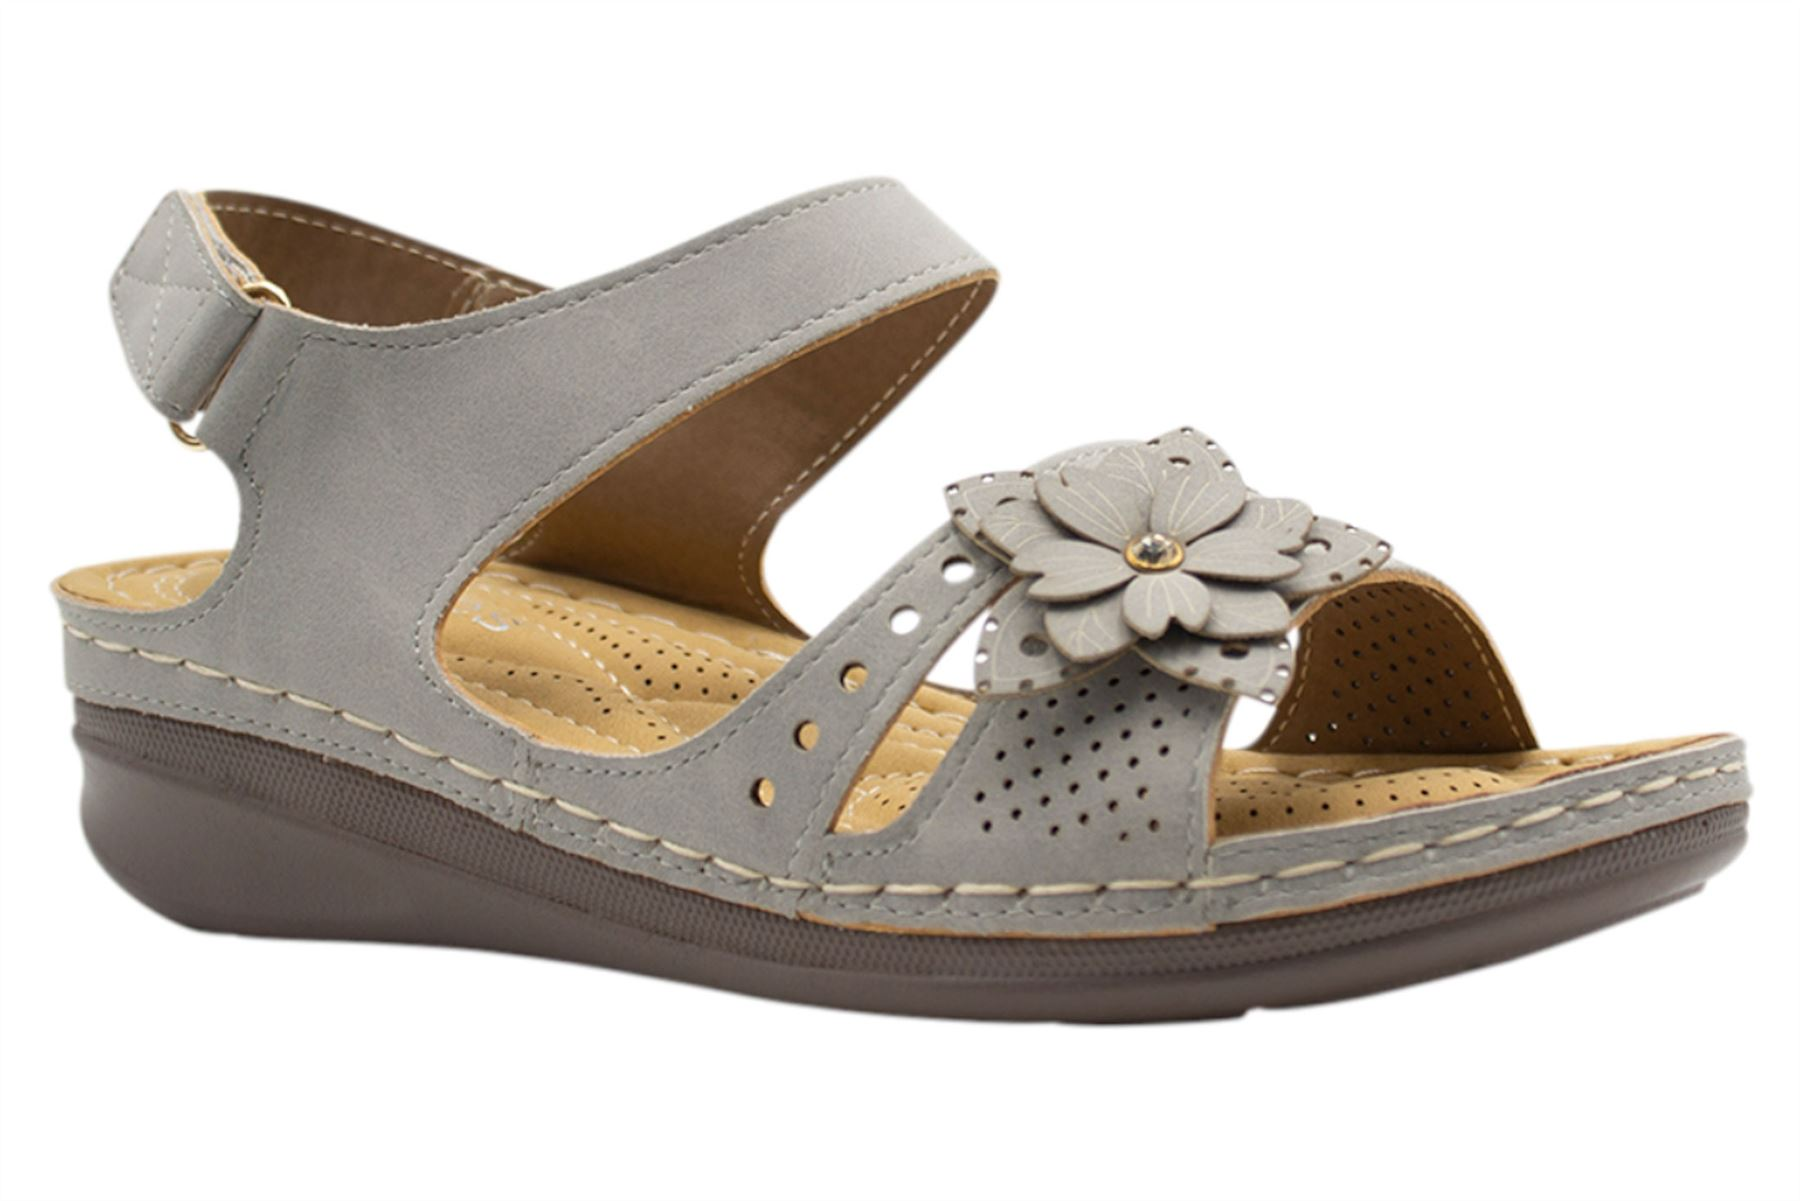 Ladies-Wedge-Heel-Sandal-Womens-Comfort-Cushion-Strapy-Summer-Shoes miniatura 27